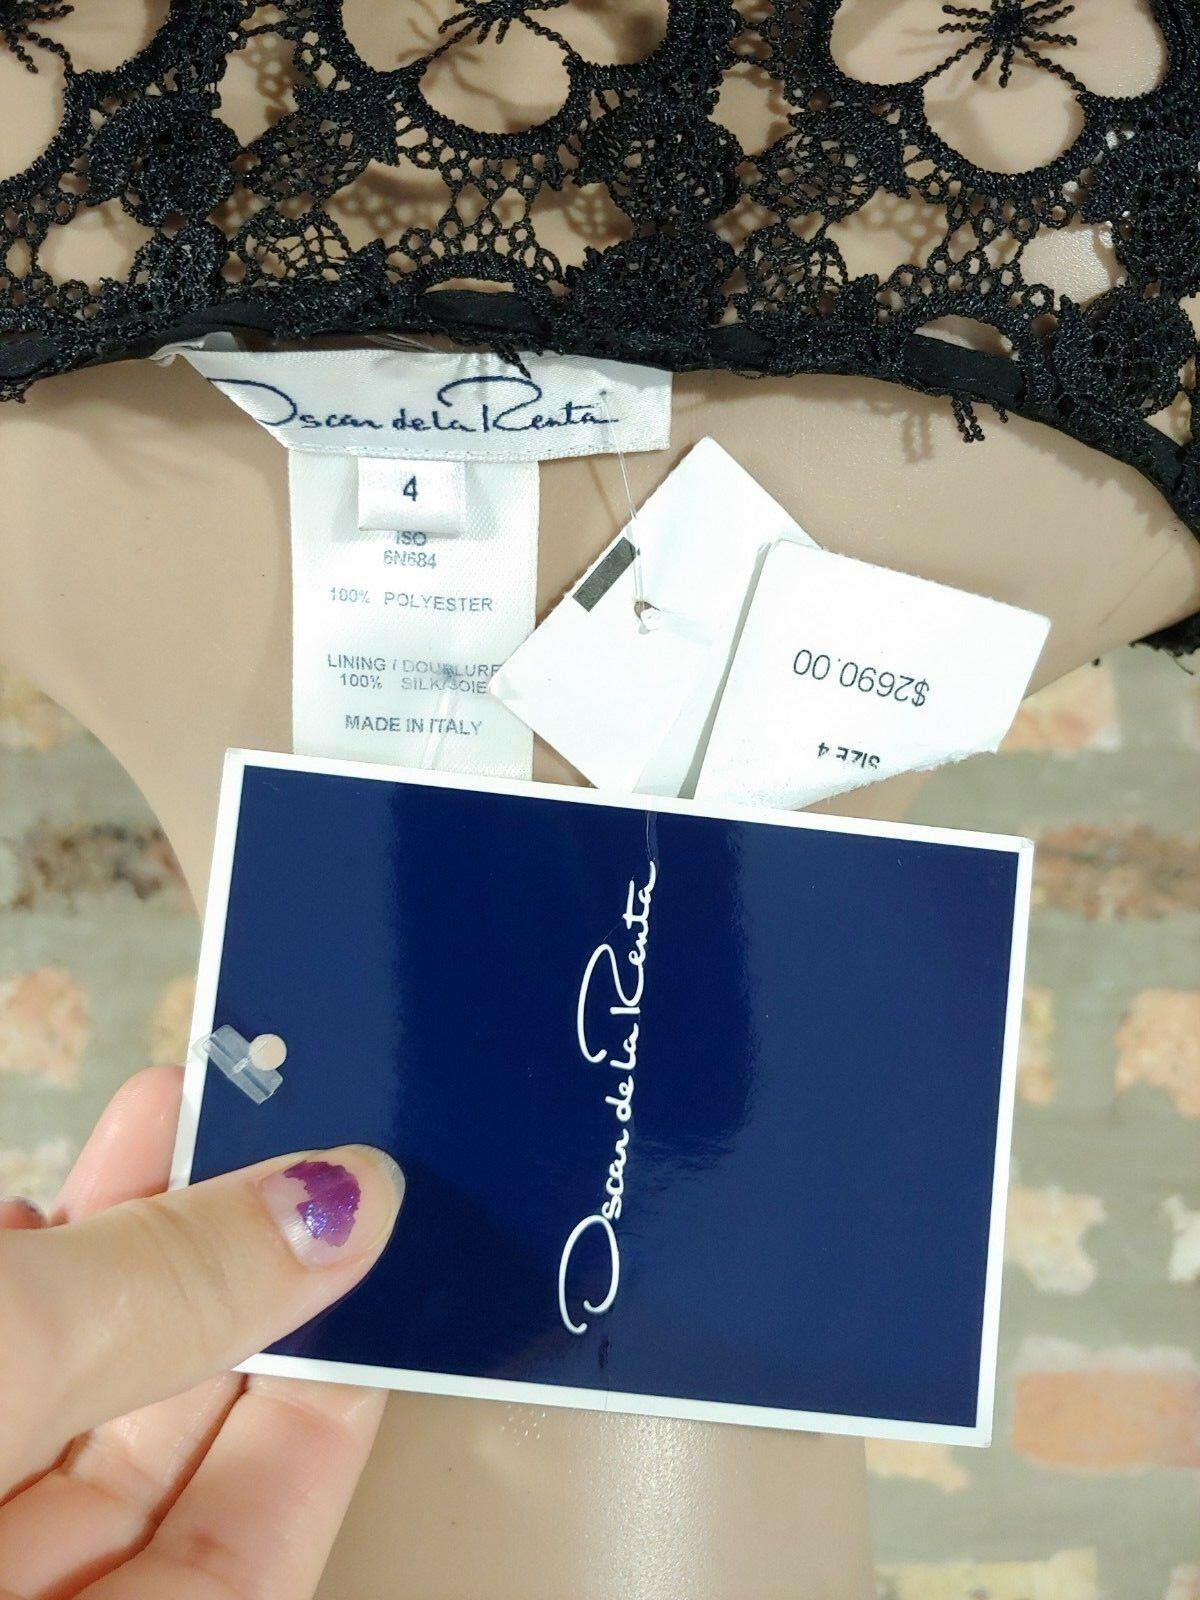 NWT Oscar De La Renta $2690 Black Bateau Neck Organza Lace Shirt Dress SZ 4